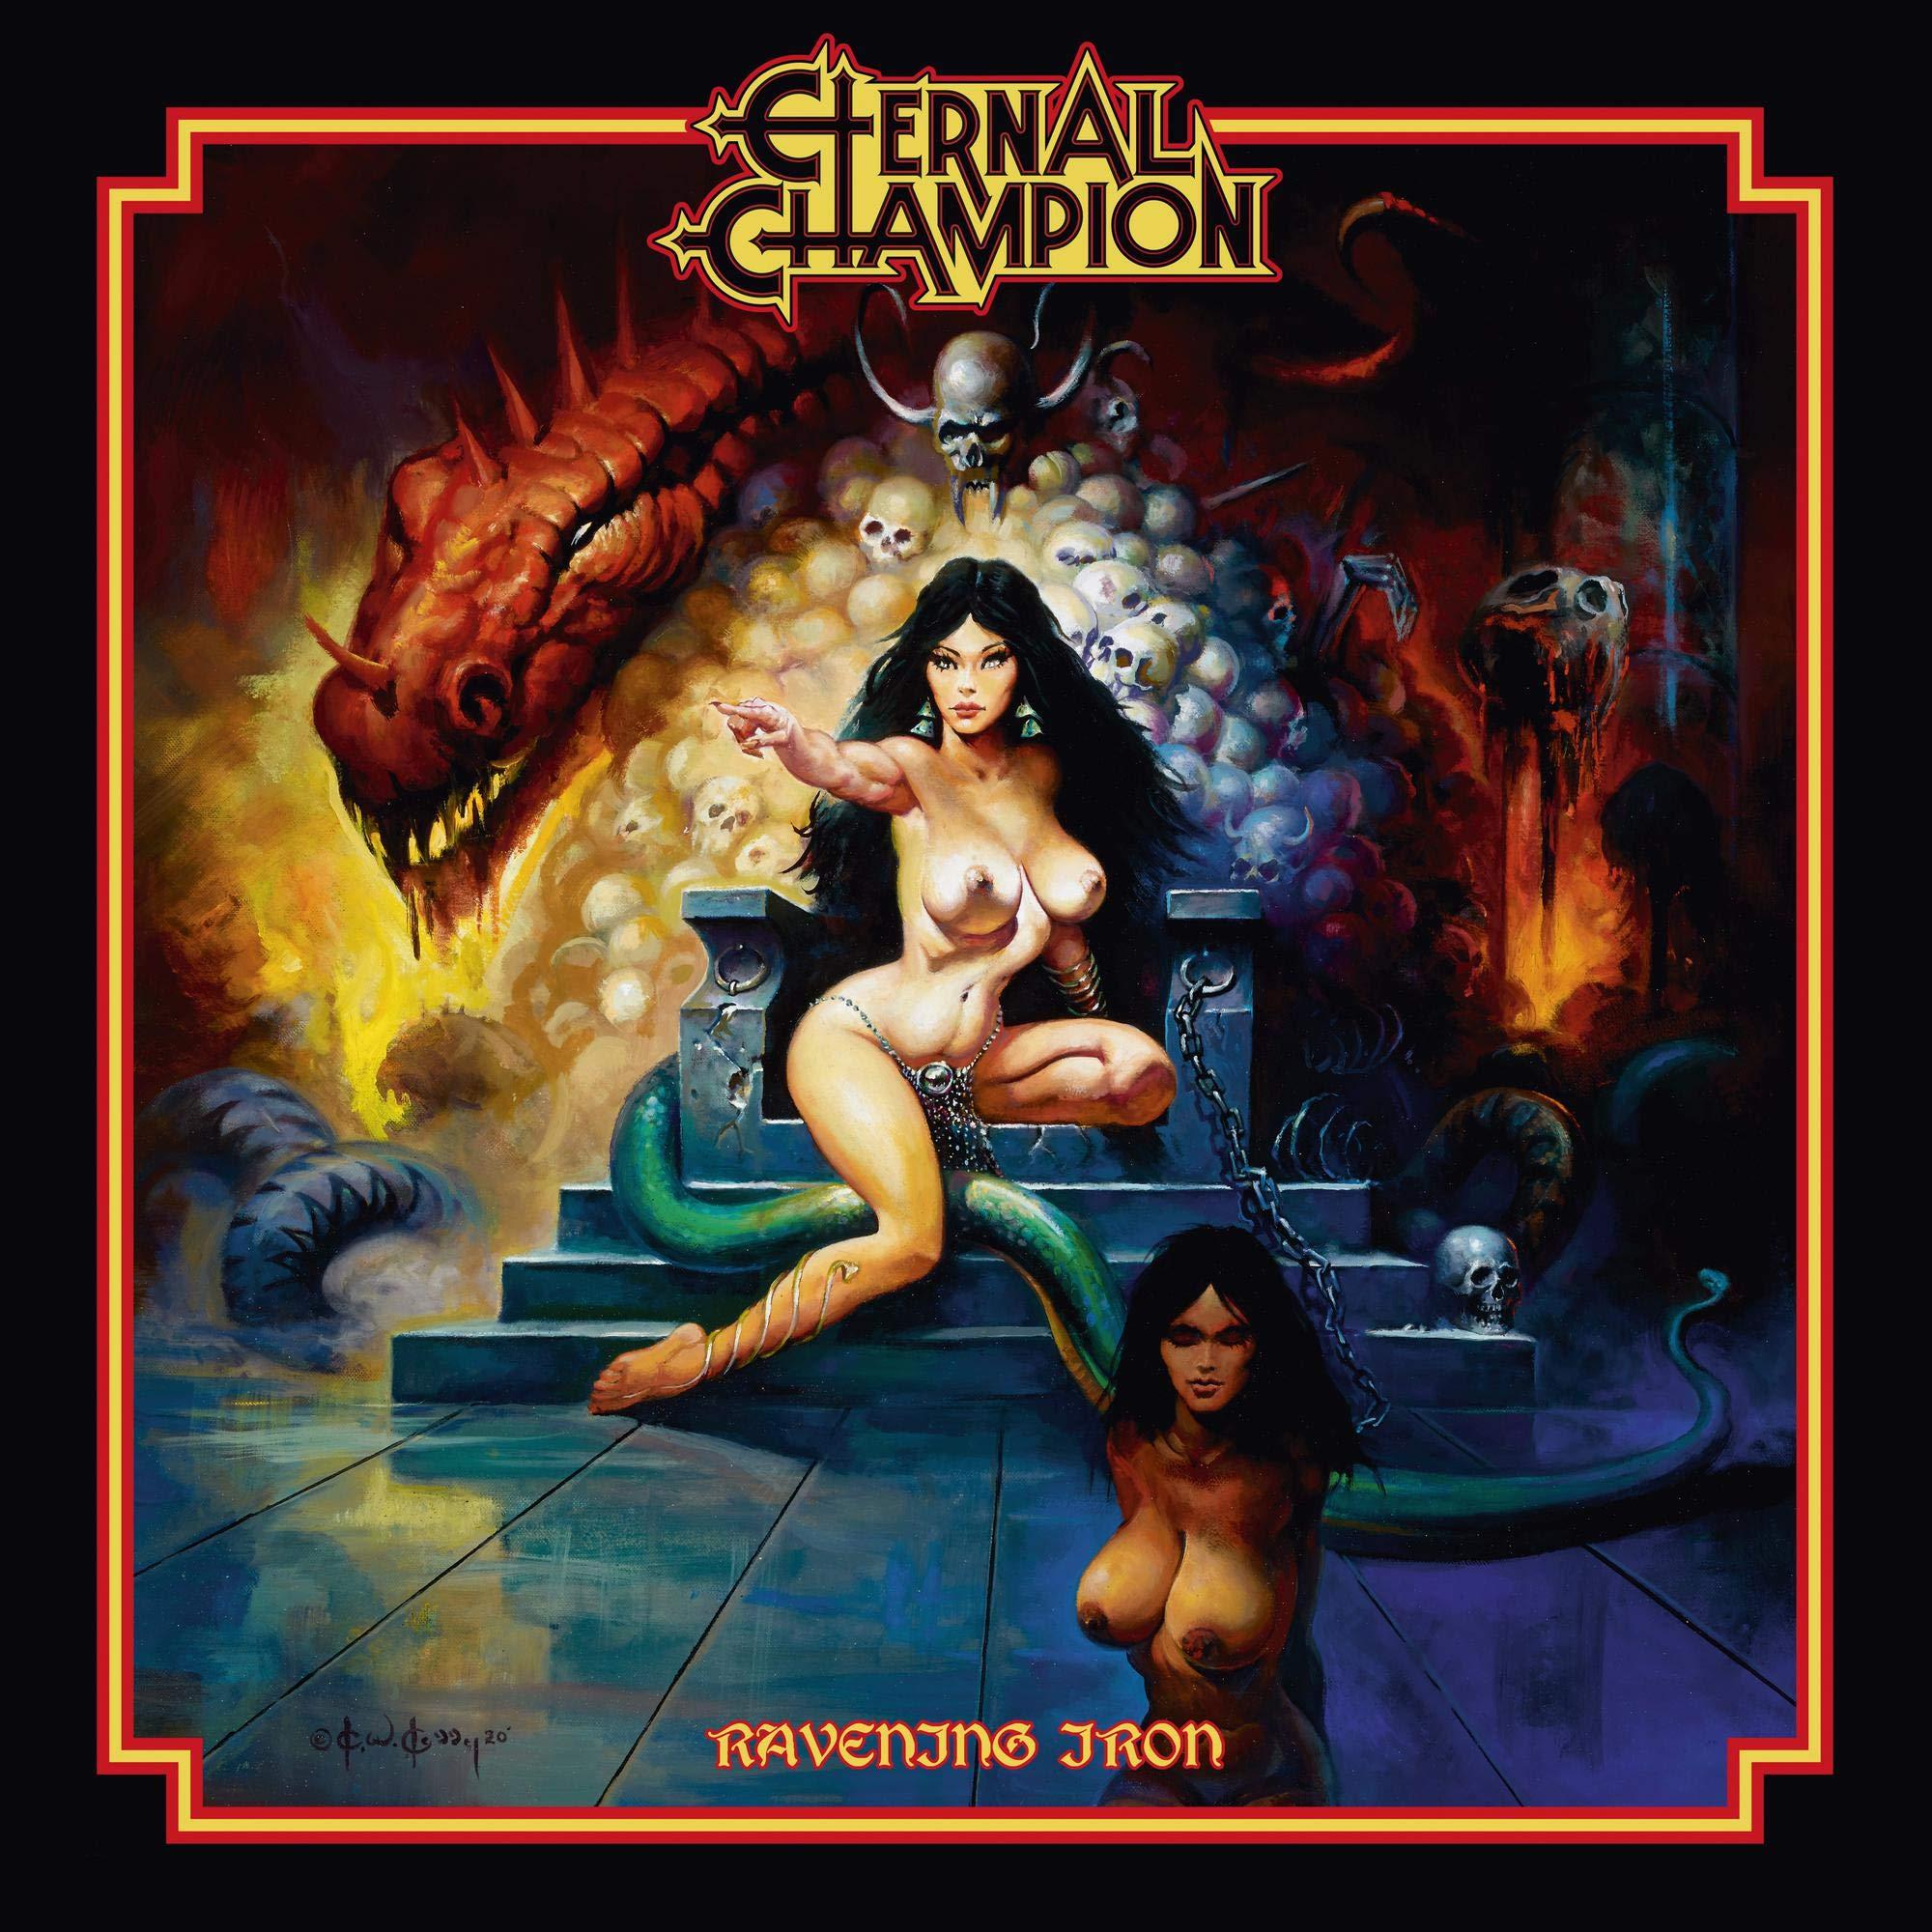 ETERNAL CHAMPION - RAVENING IRON (CD)